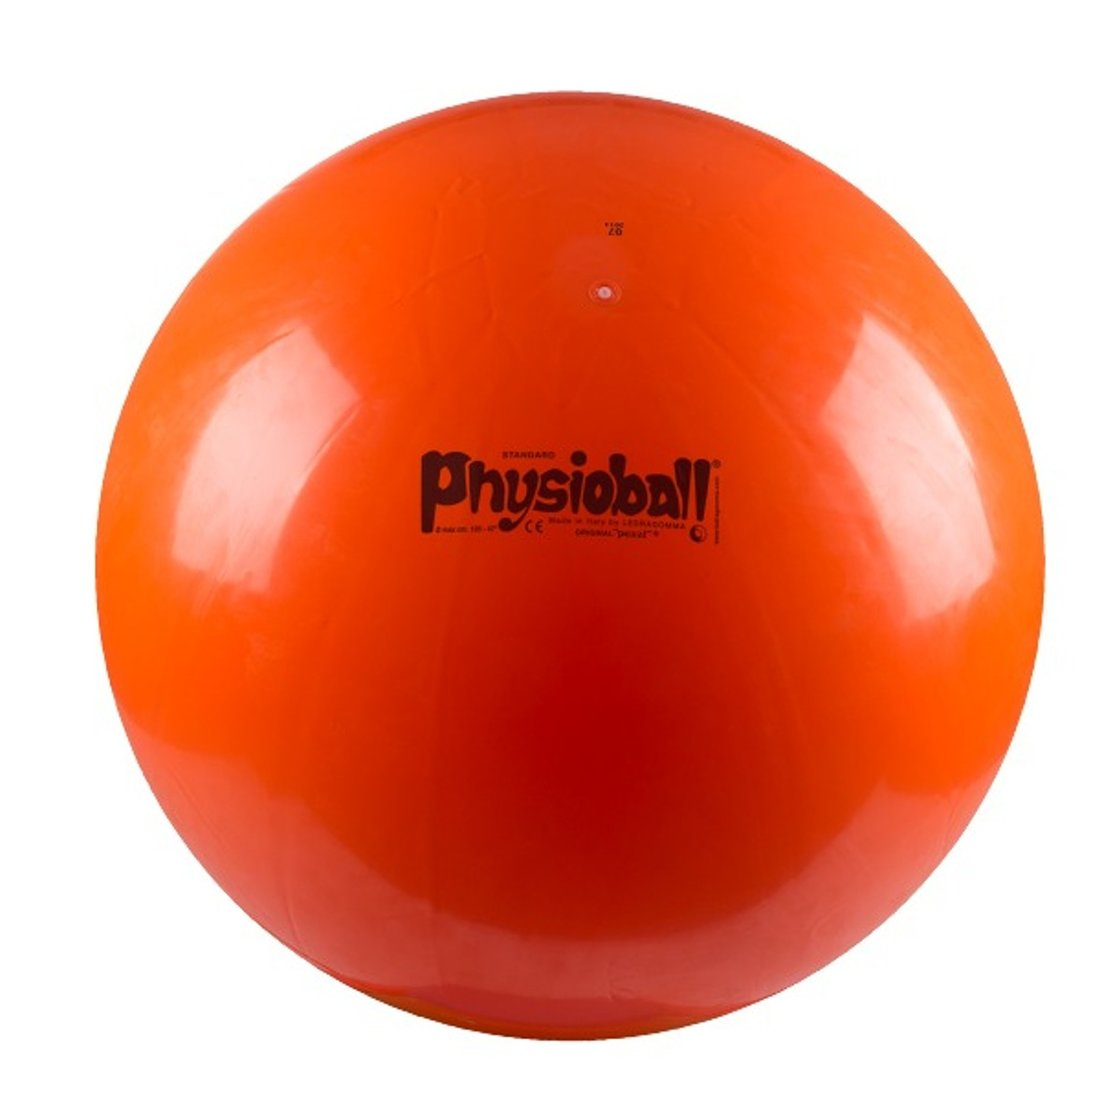 pezzi gymnastikball physioball sitzball 120 cm orange. Black Bedroom Furniture Sets. Home Design Ideas